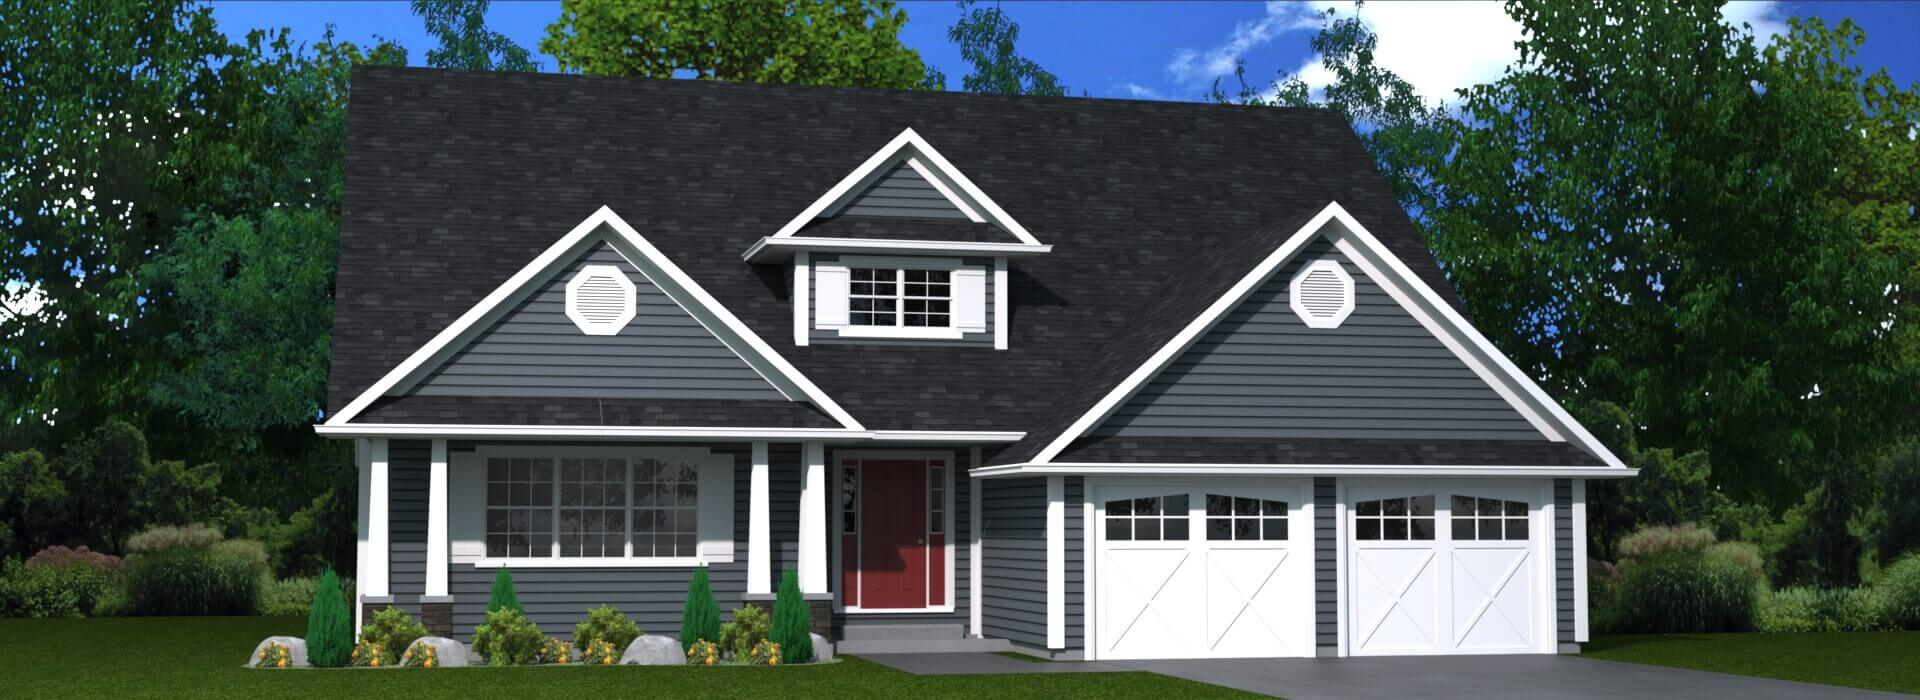 2405 house elevation